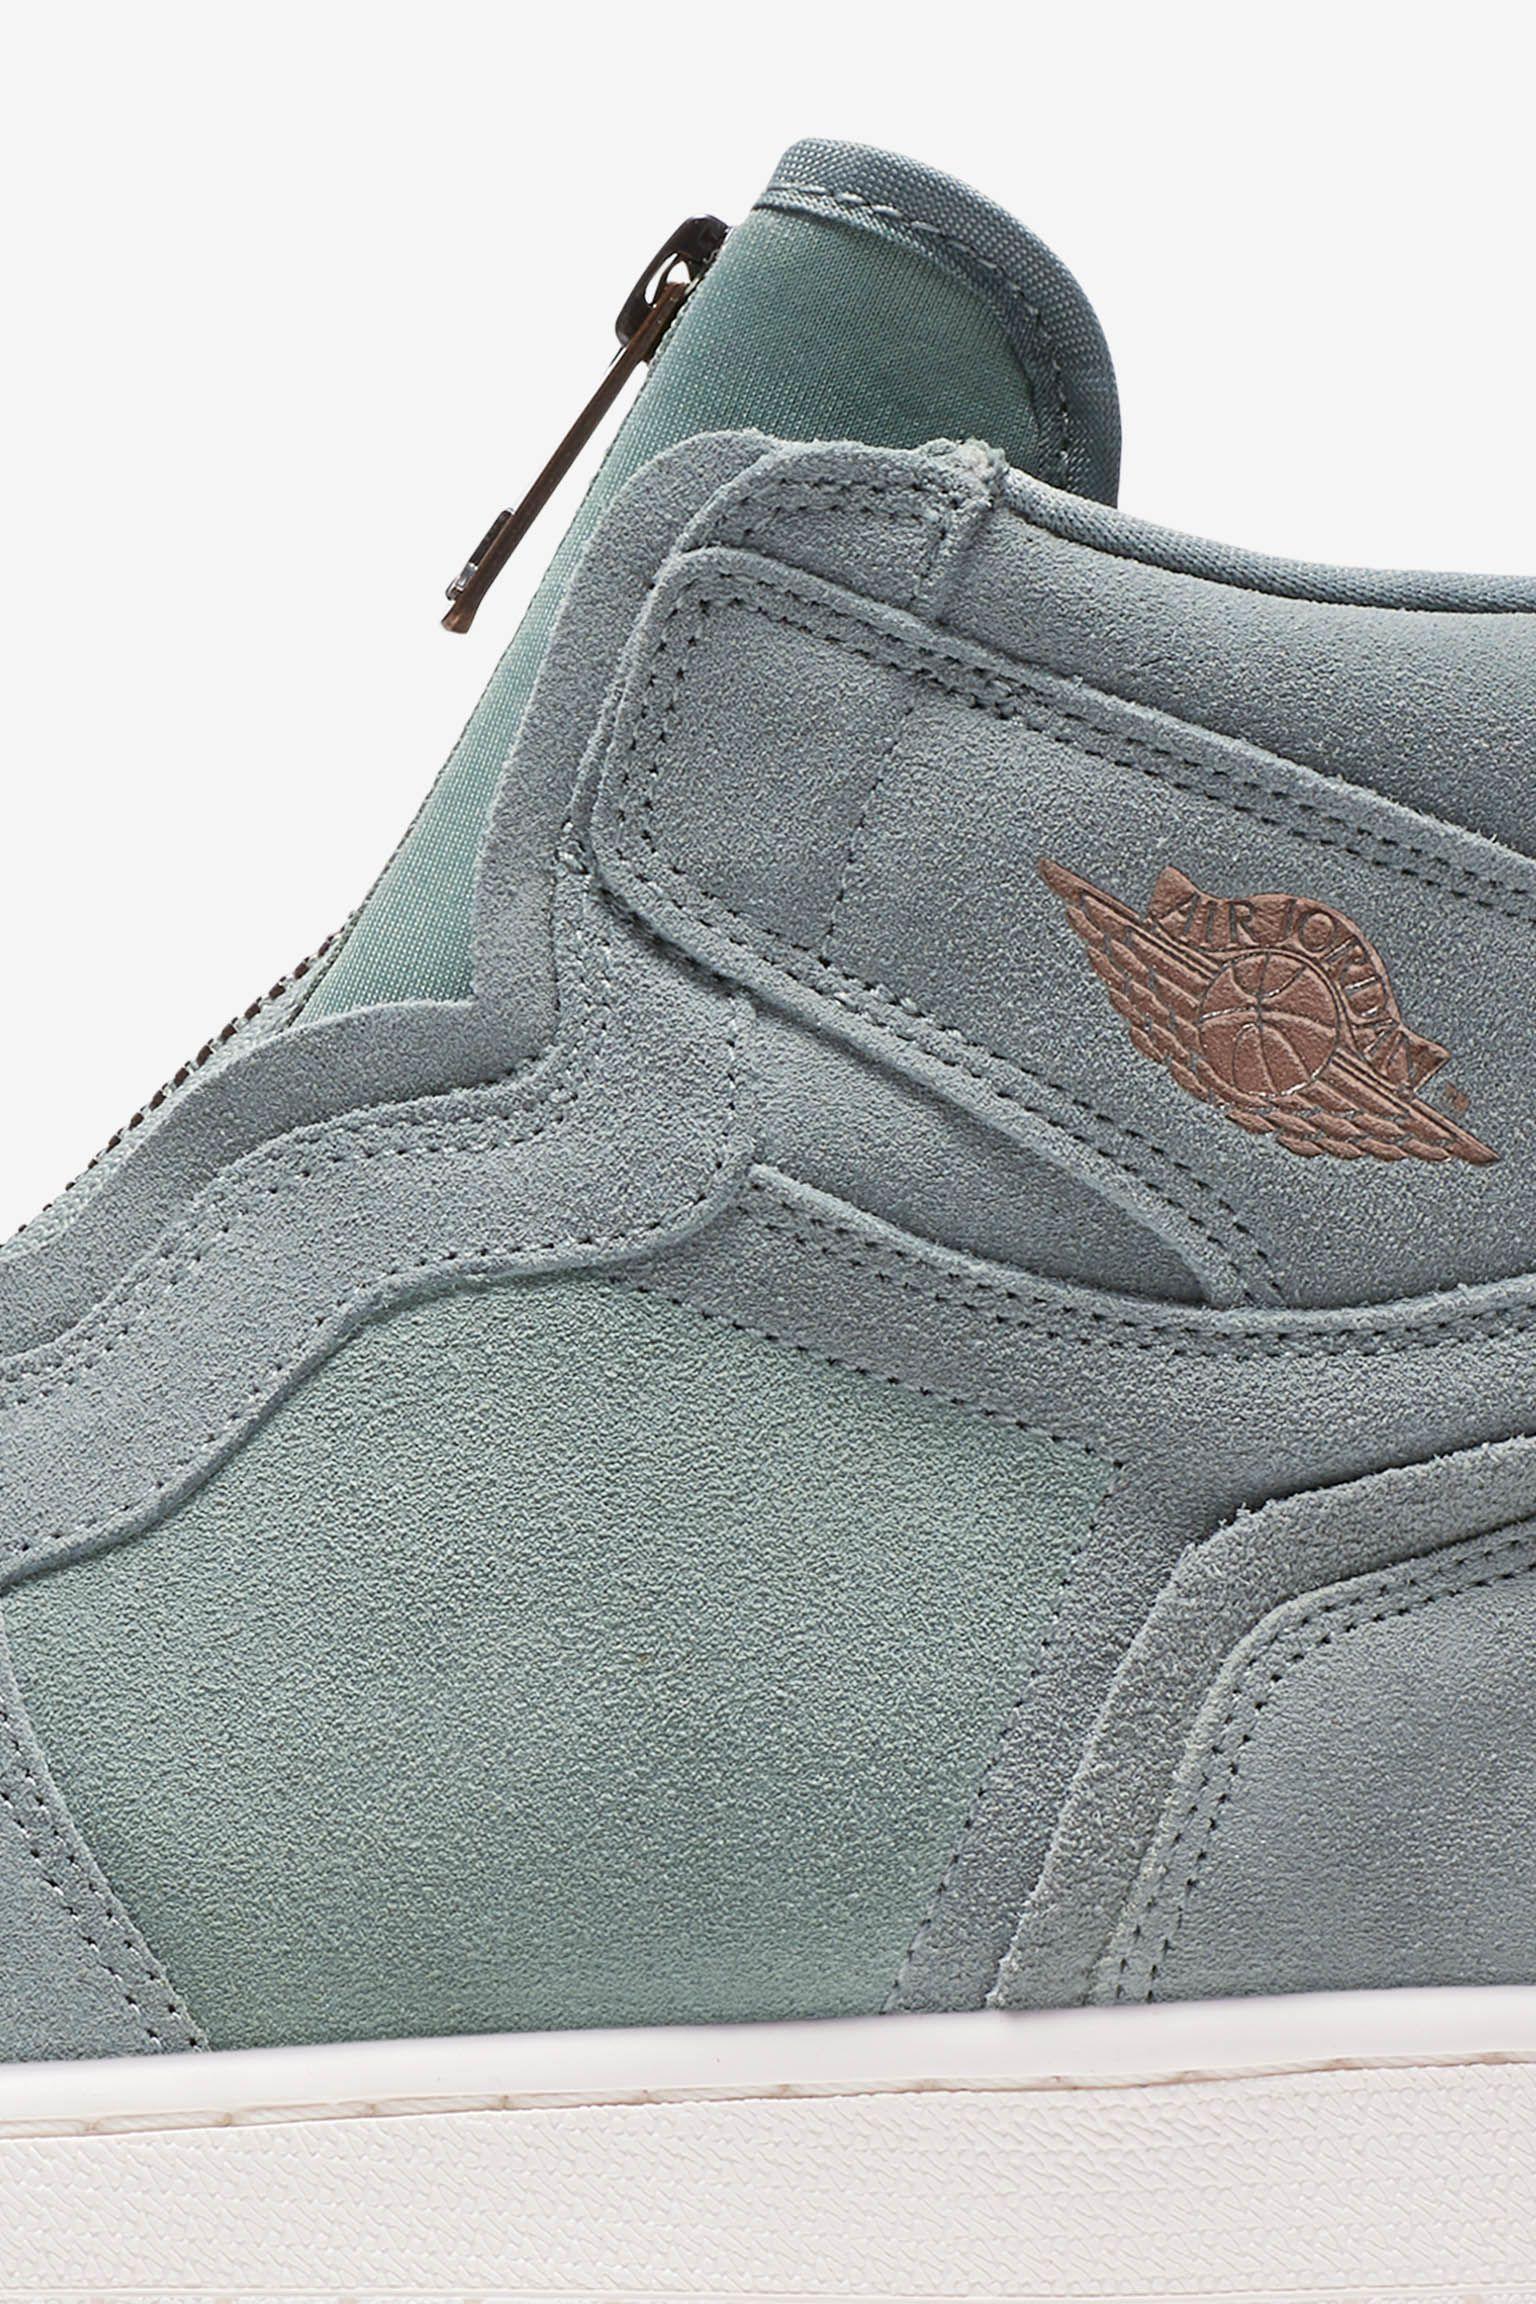 Women's Air Jordan 1 High Zip 'Mica Green & Sail' Release Date